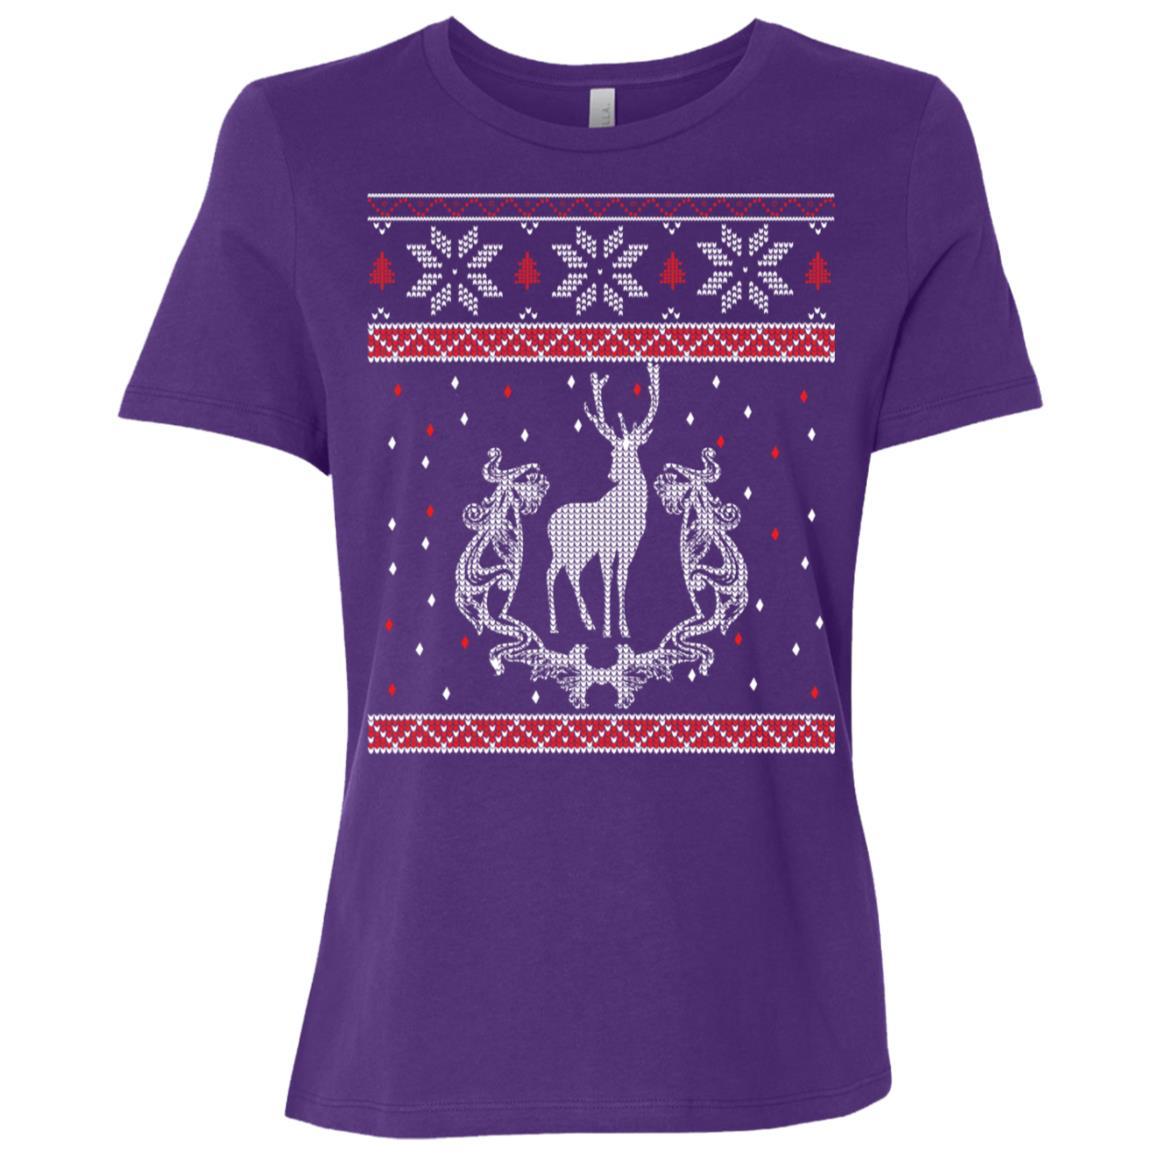 Deer Hunter Ugly Sweatshirt Hunter Christmas Gift Women Short Sleeve T-Shirt